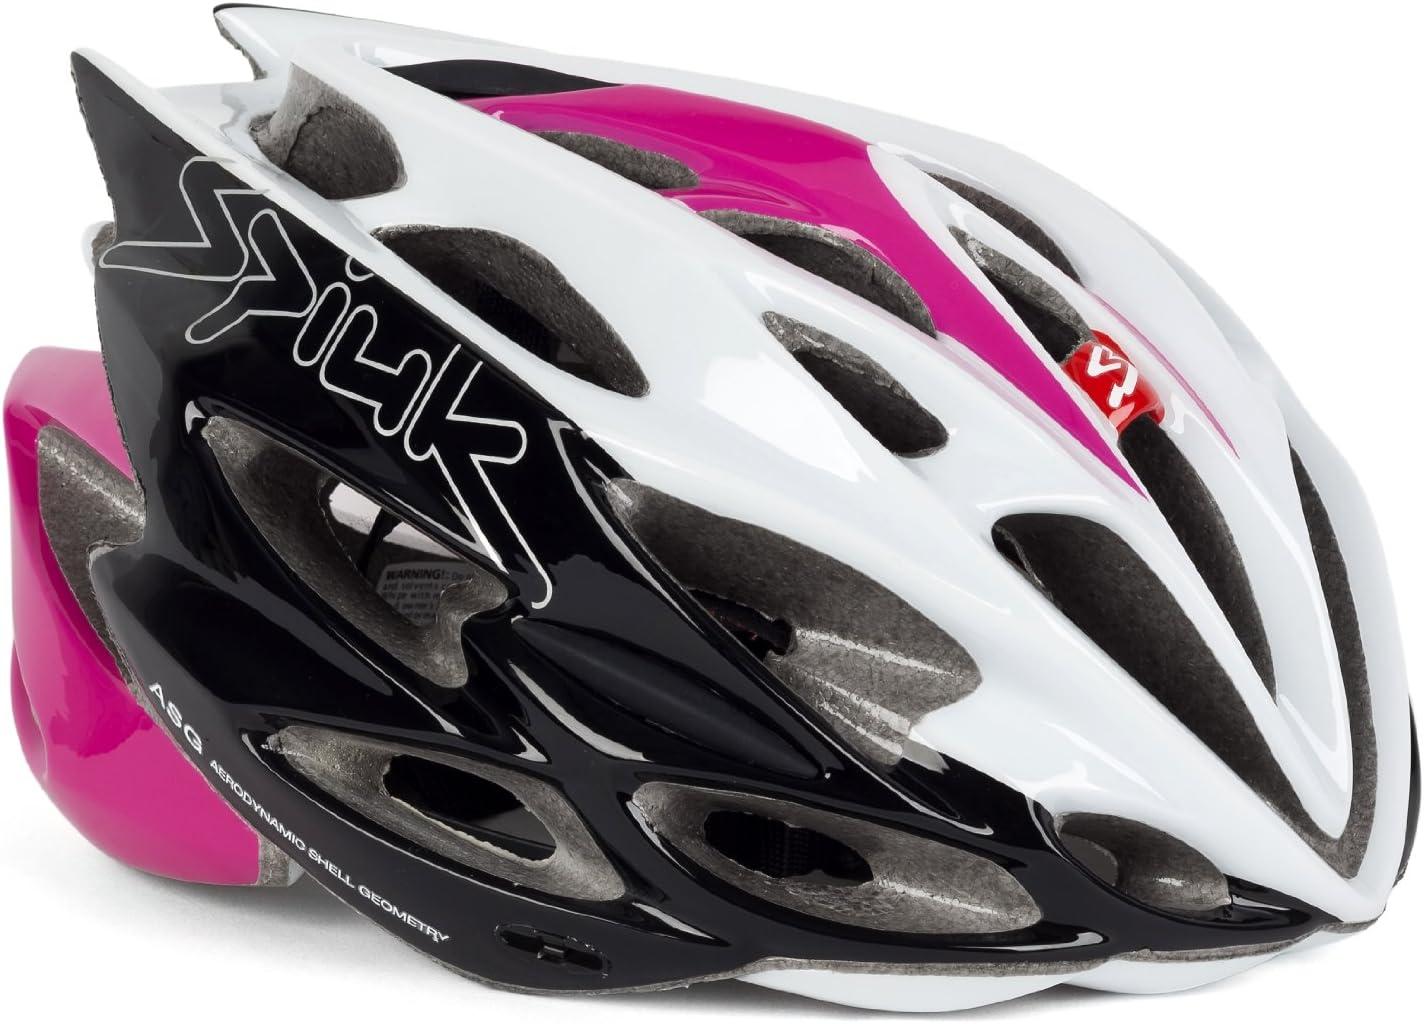 Spiuk Nexion - Casco de ciclismo, color fucsia / blanco / negro ...